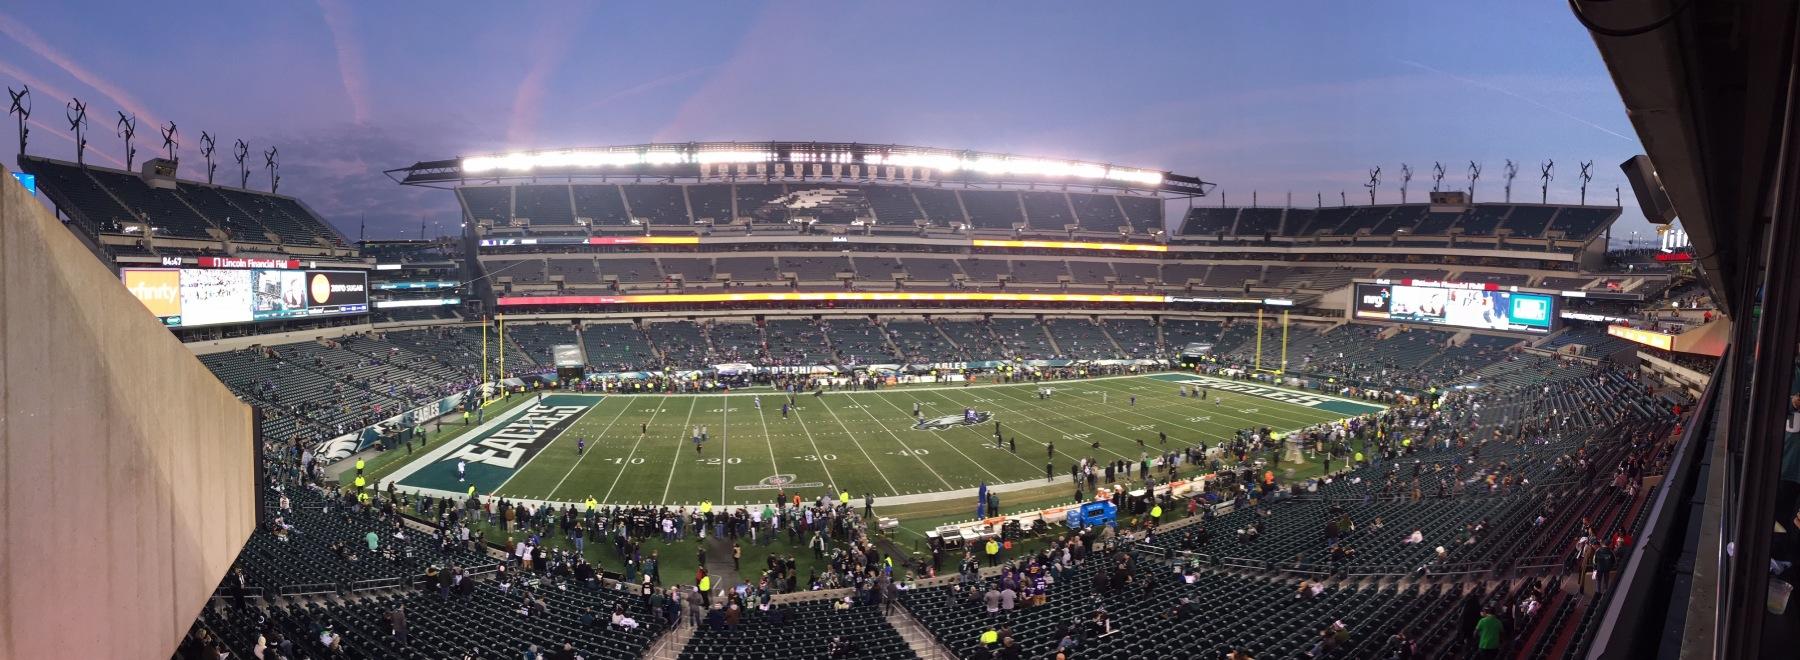 Stadium.thumb.jpg.f2ff93cdc9d65ede39e9c094bac0626a.jpg